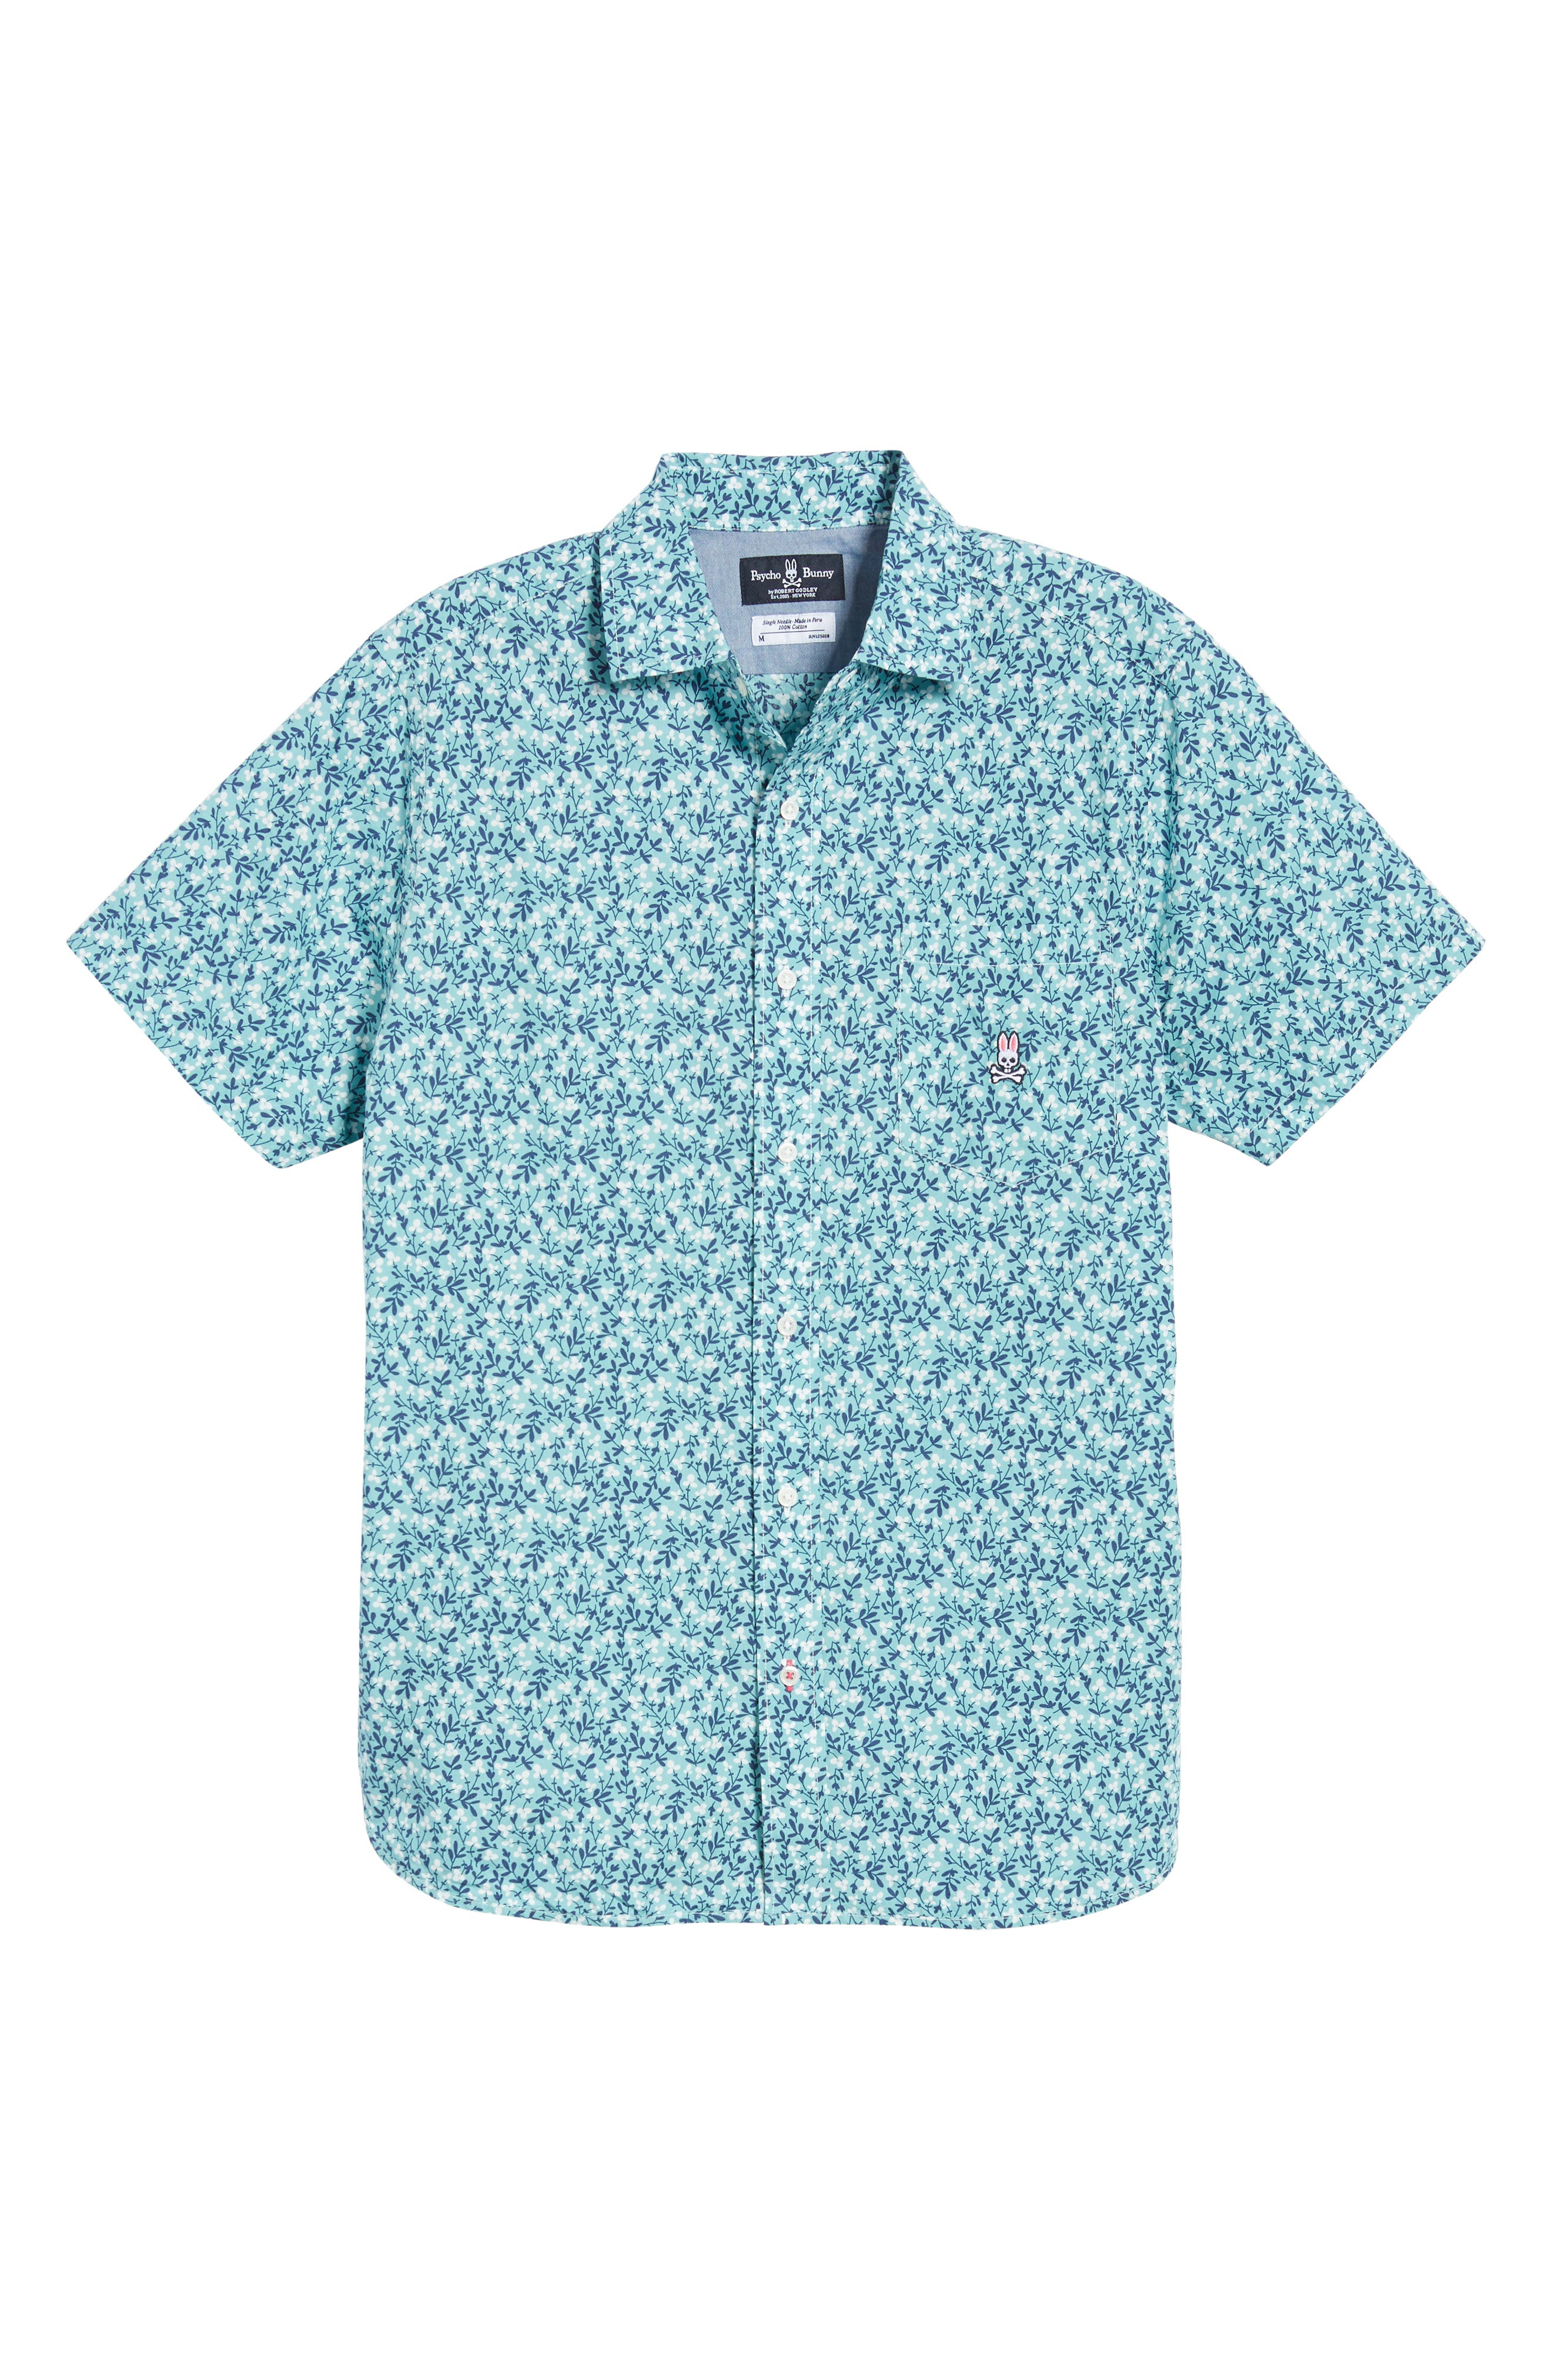 PSYCHO BUNNY,                             Tiny Floral Camp Shirt,                             Alternate thumbnail 6, color,                             ULTRAMARINE